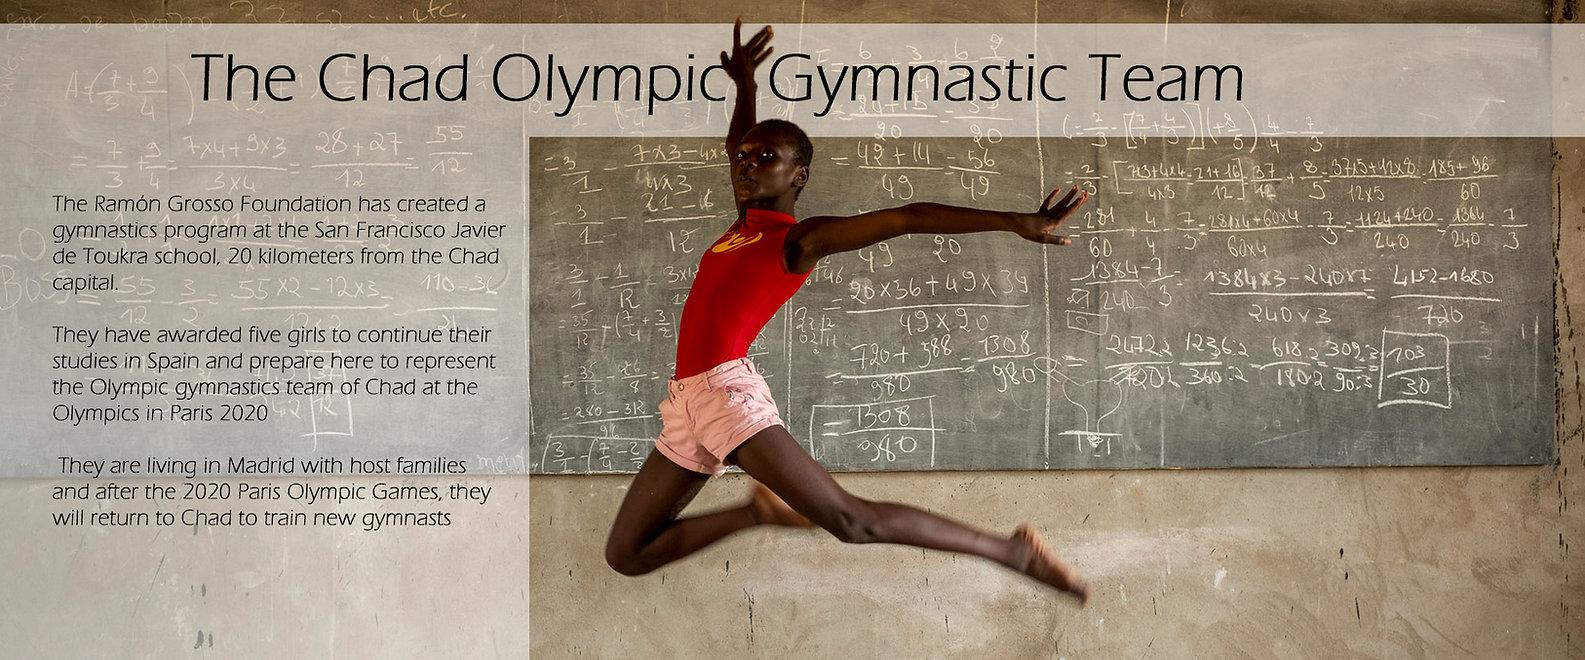 The Chad Olympic Gymnastic Team.jpg